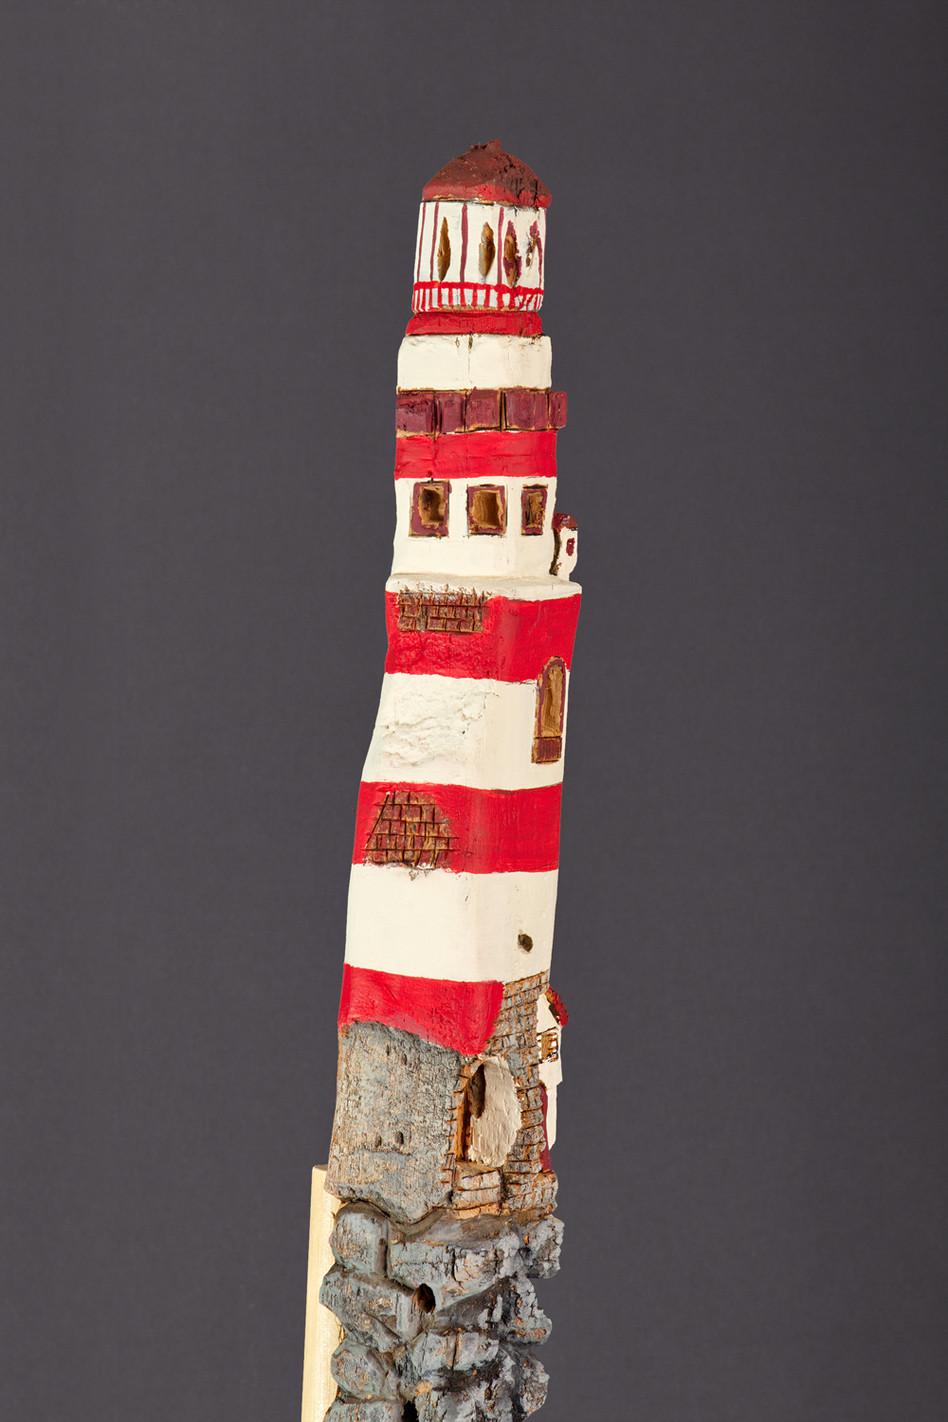 LJC-Tall_Lighthouse-Close_Up_Lighthouse.